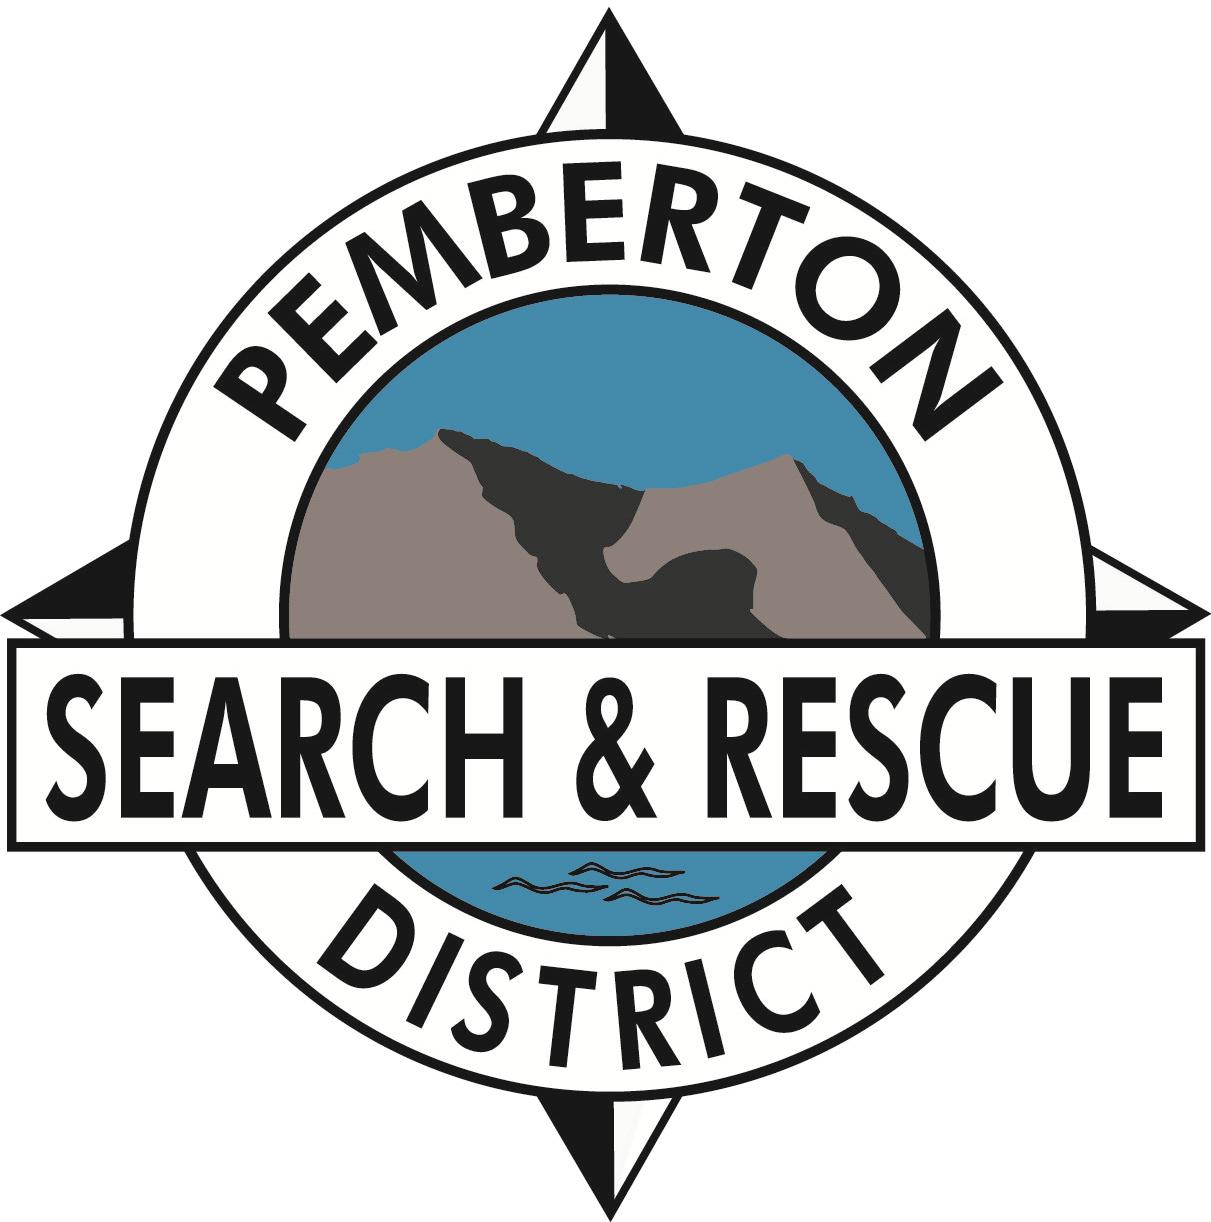 Pemberton Search and Rescue